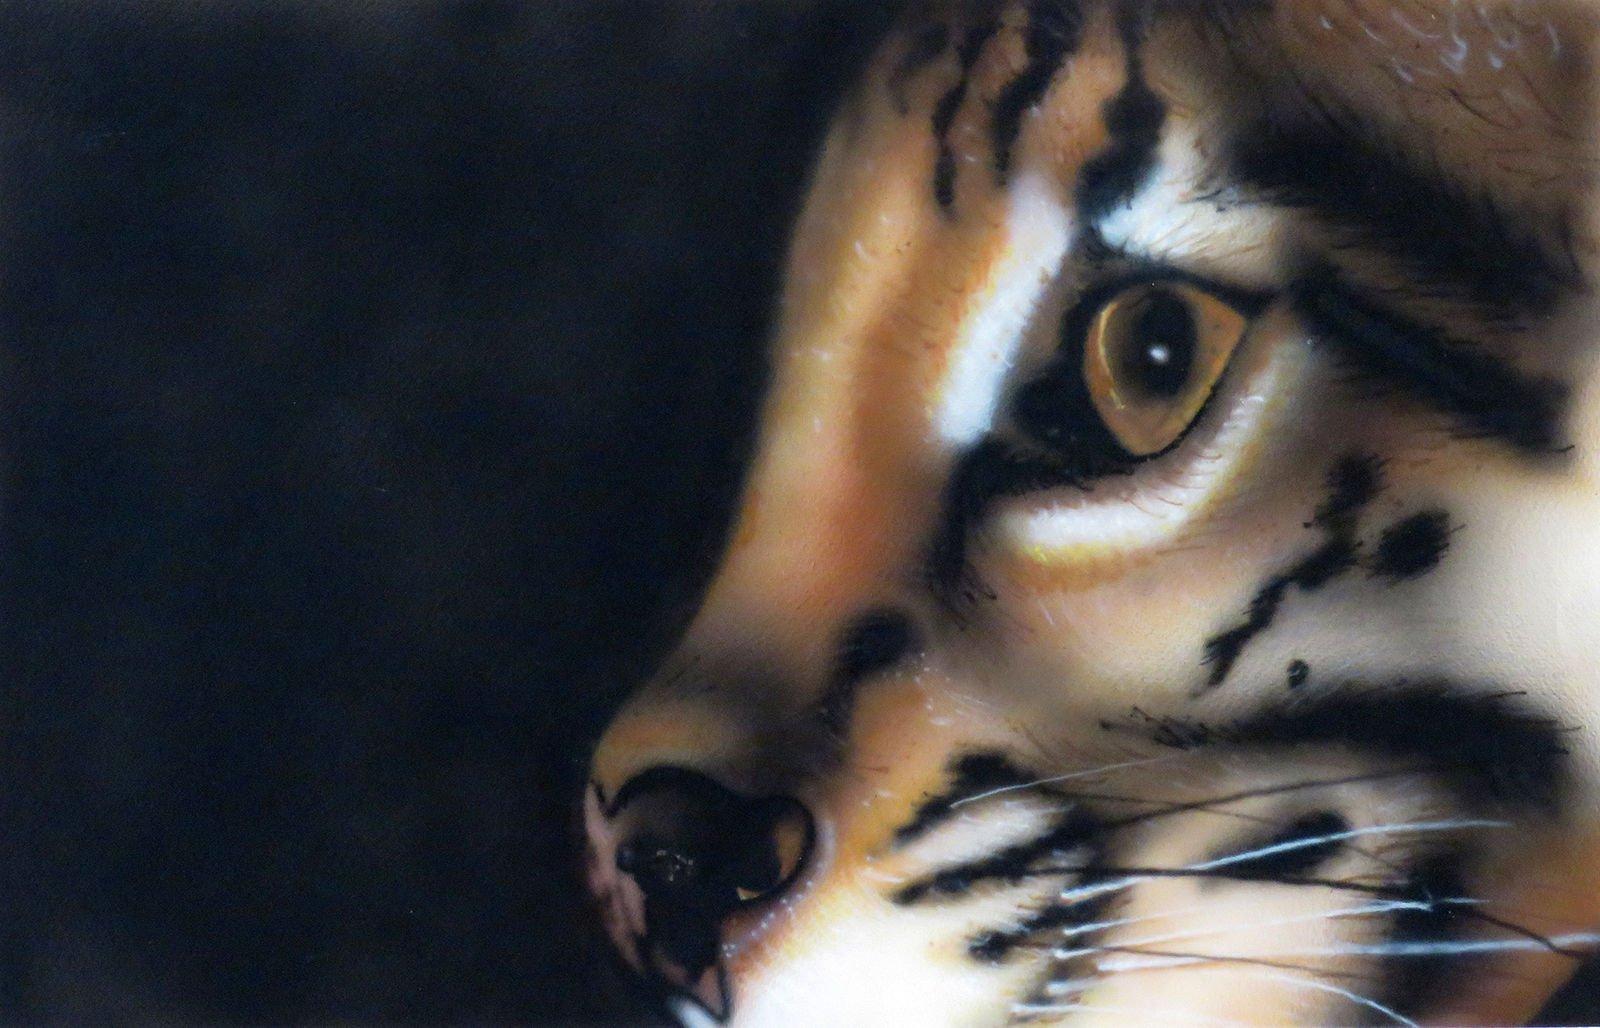 Ocelot airbrush painting